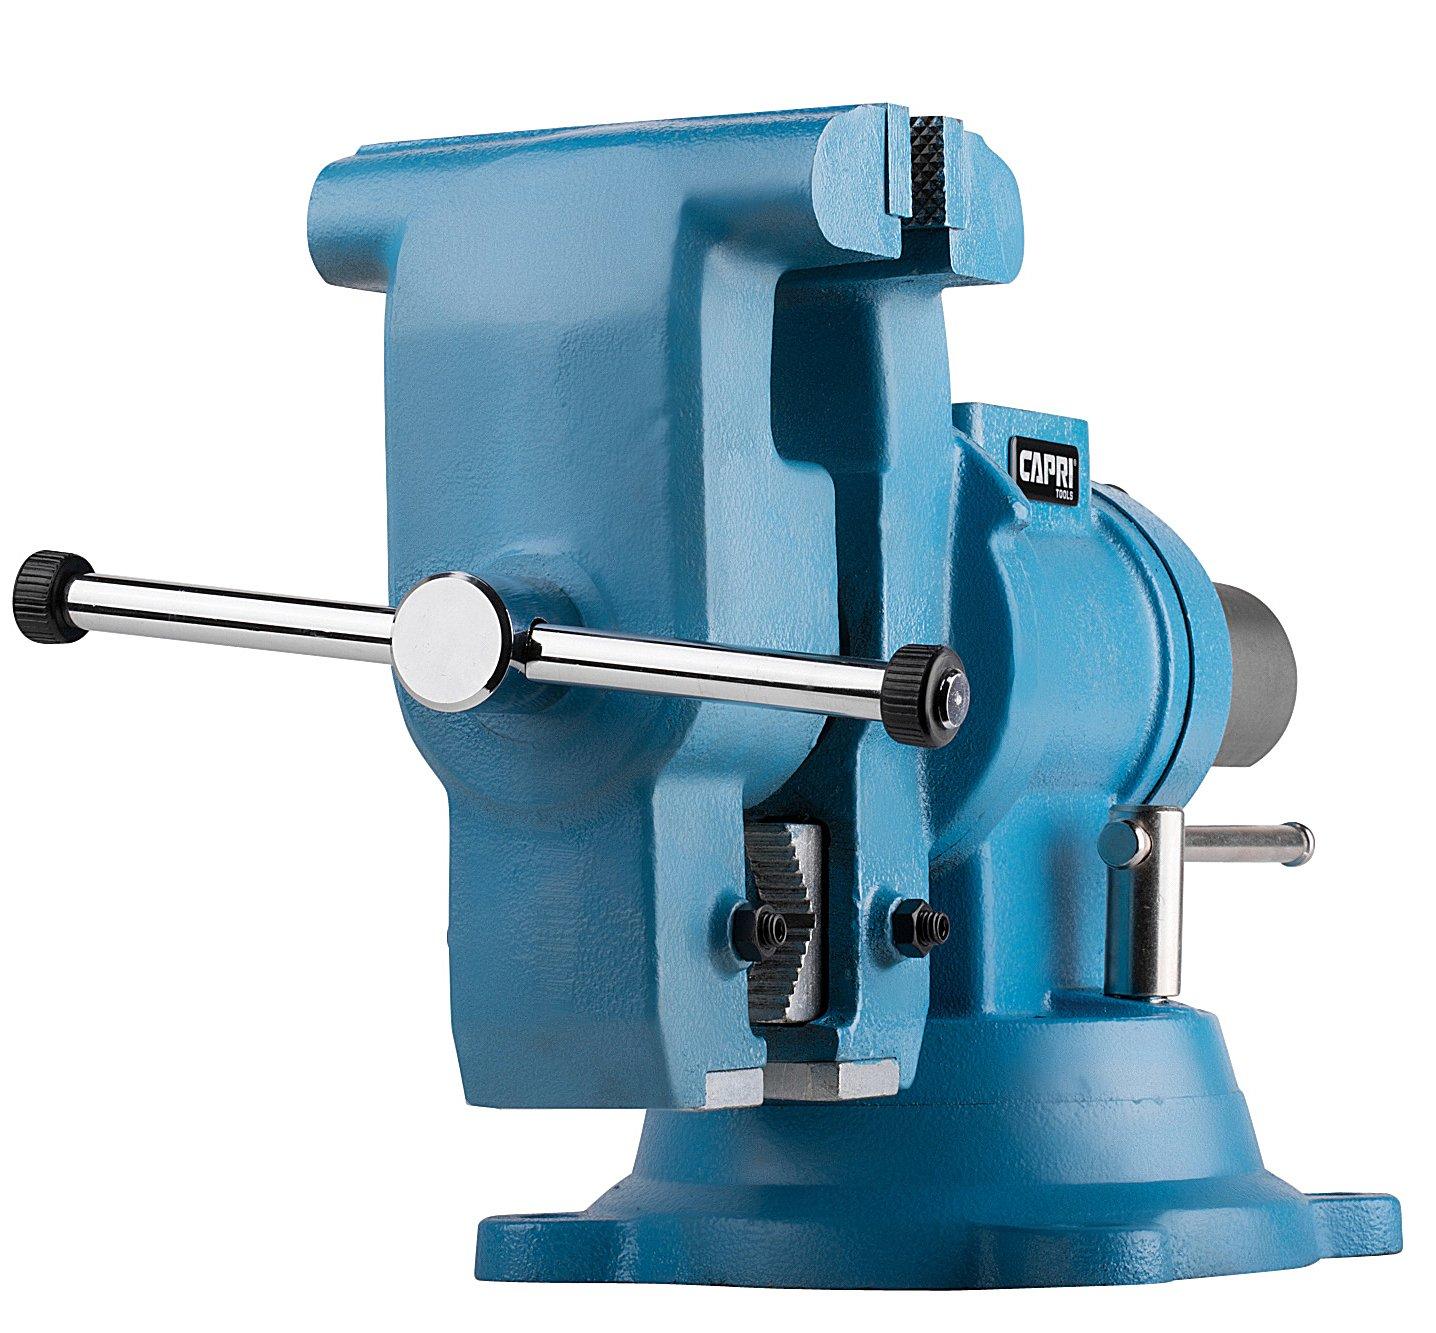 Capri Tools 10519 Rotating Base and Head Bench Vise, 6''